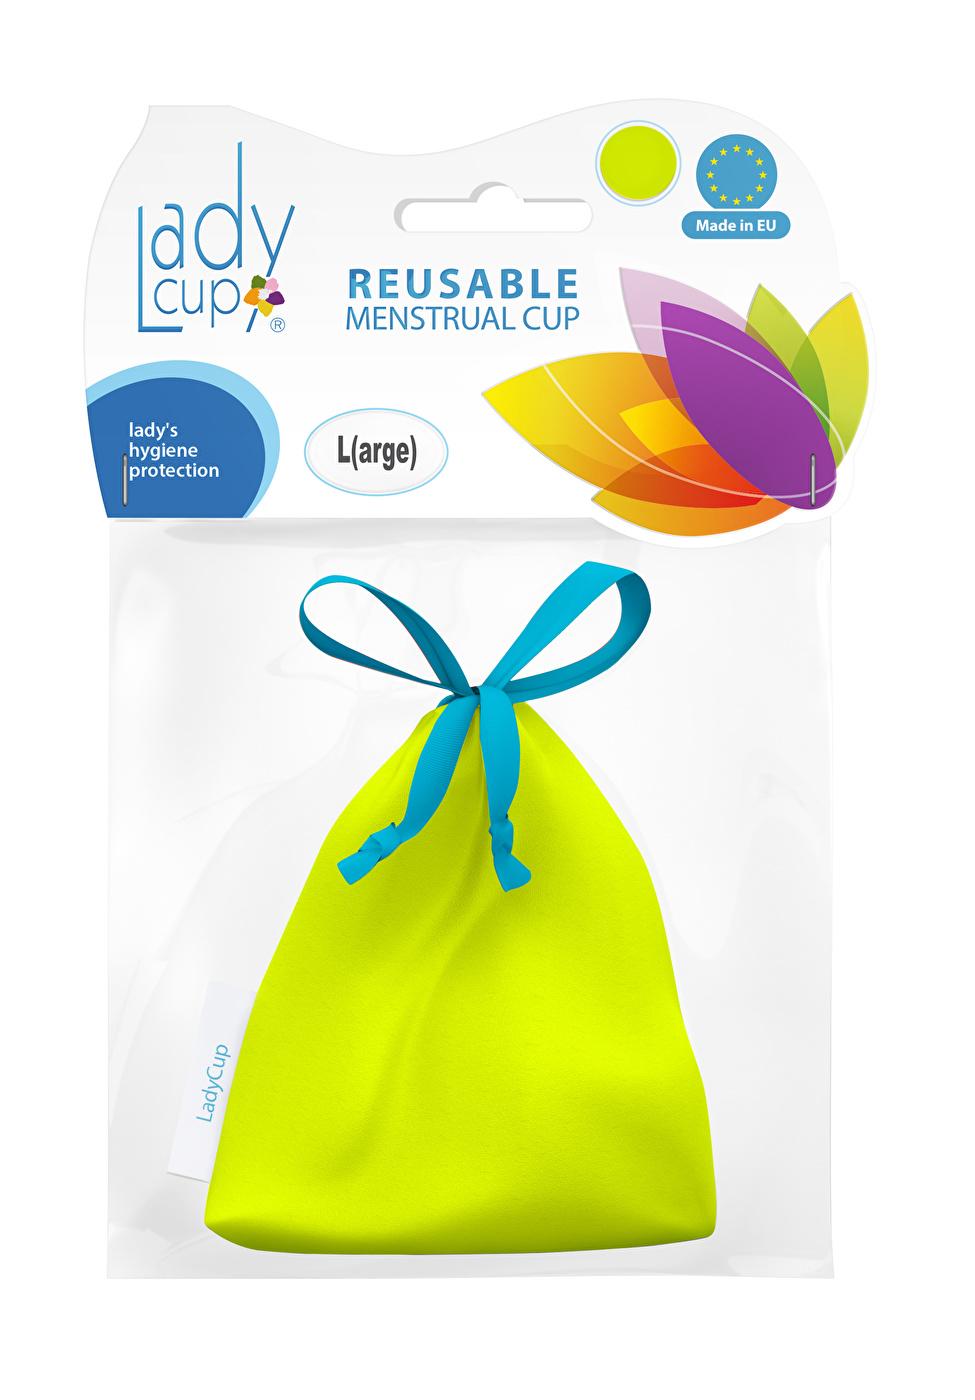 ladycup-menskopp-neon-plastförpackning